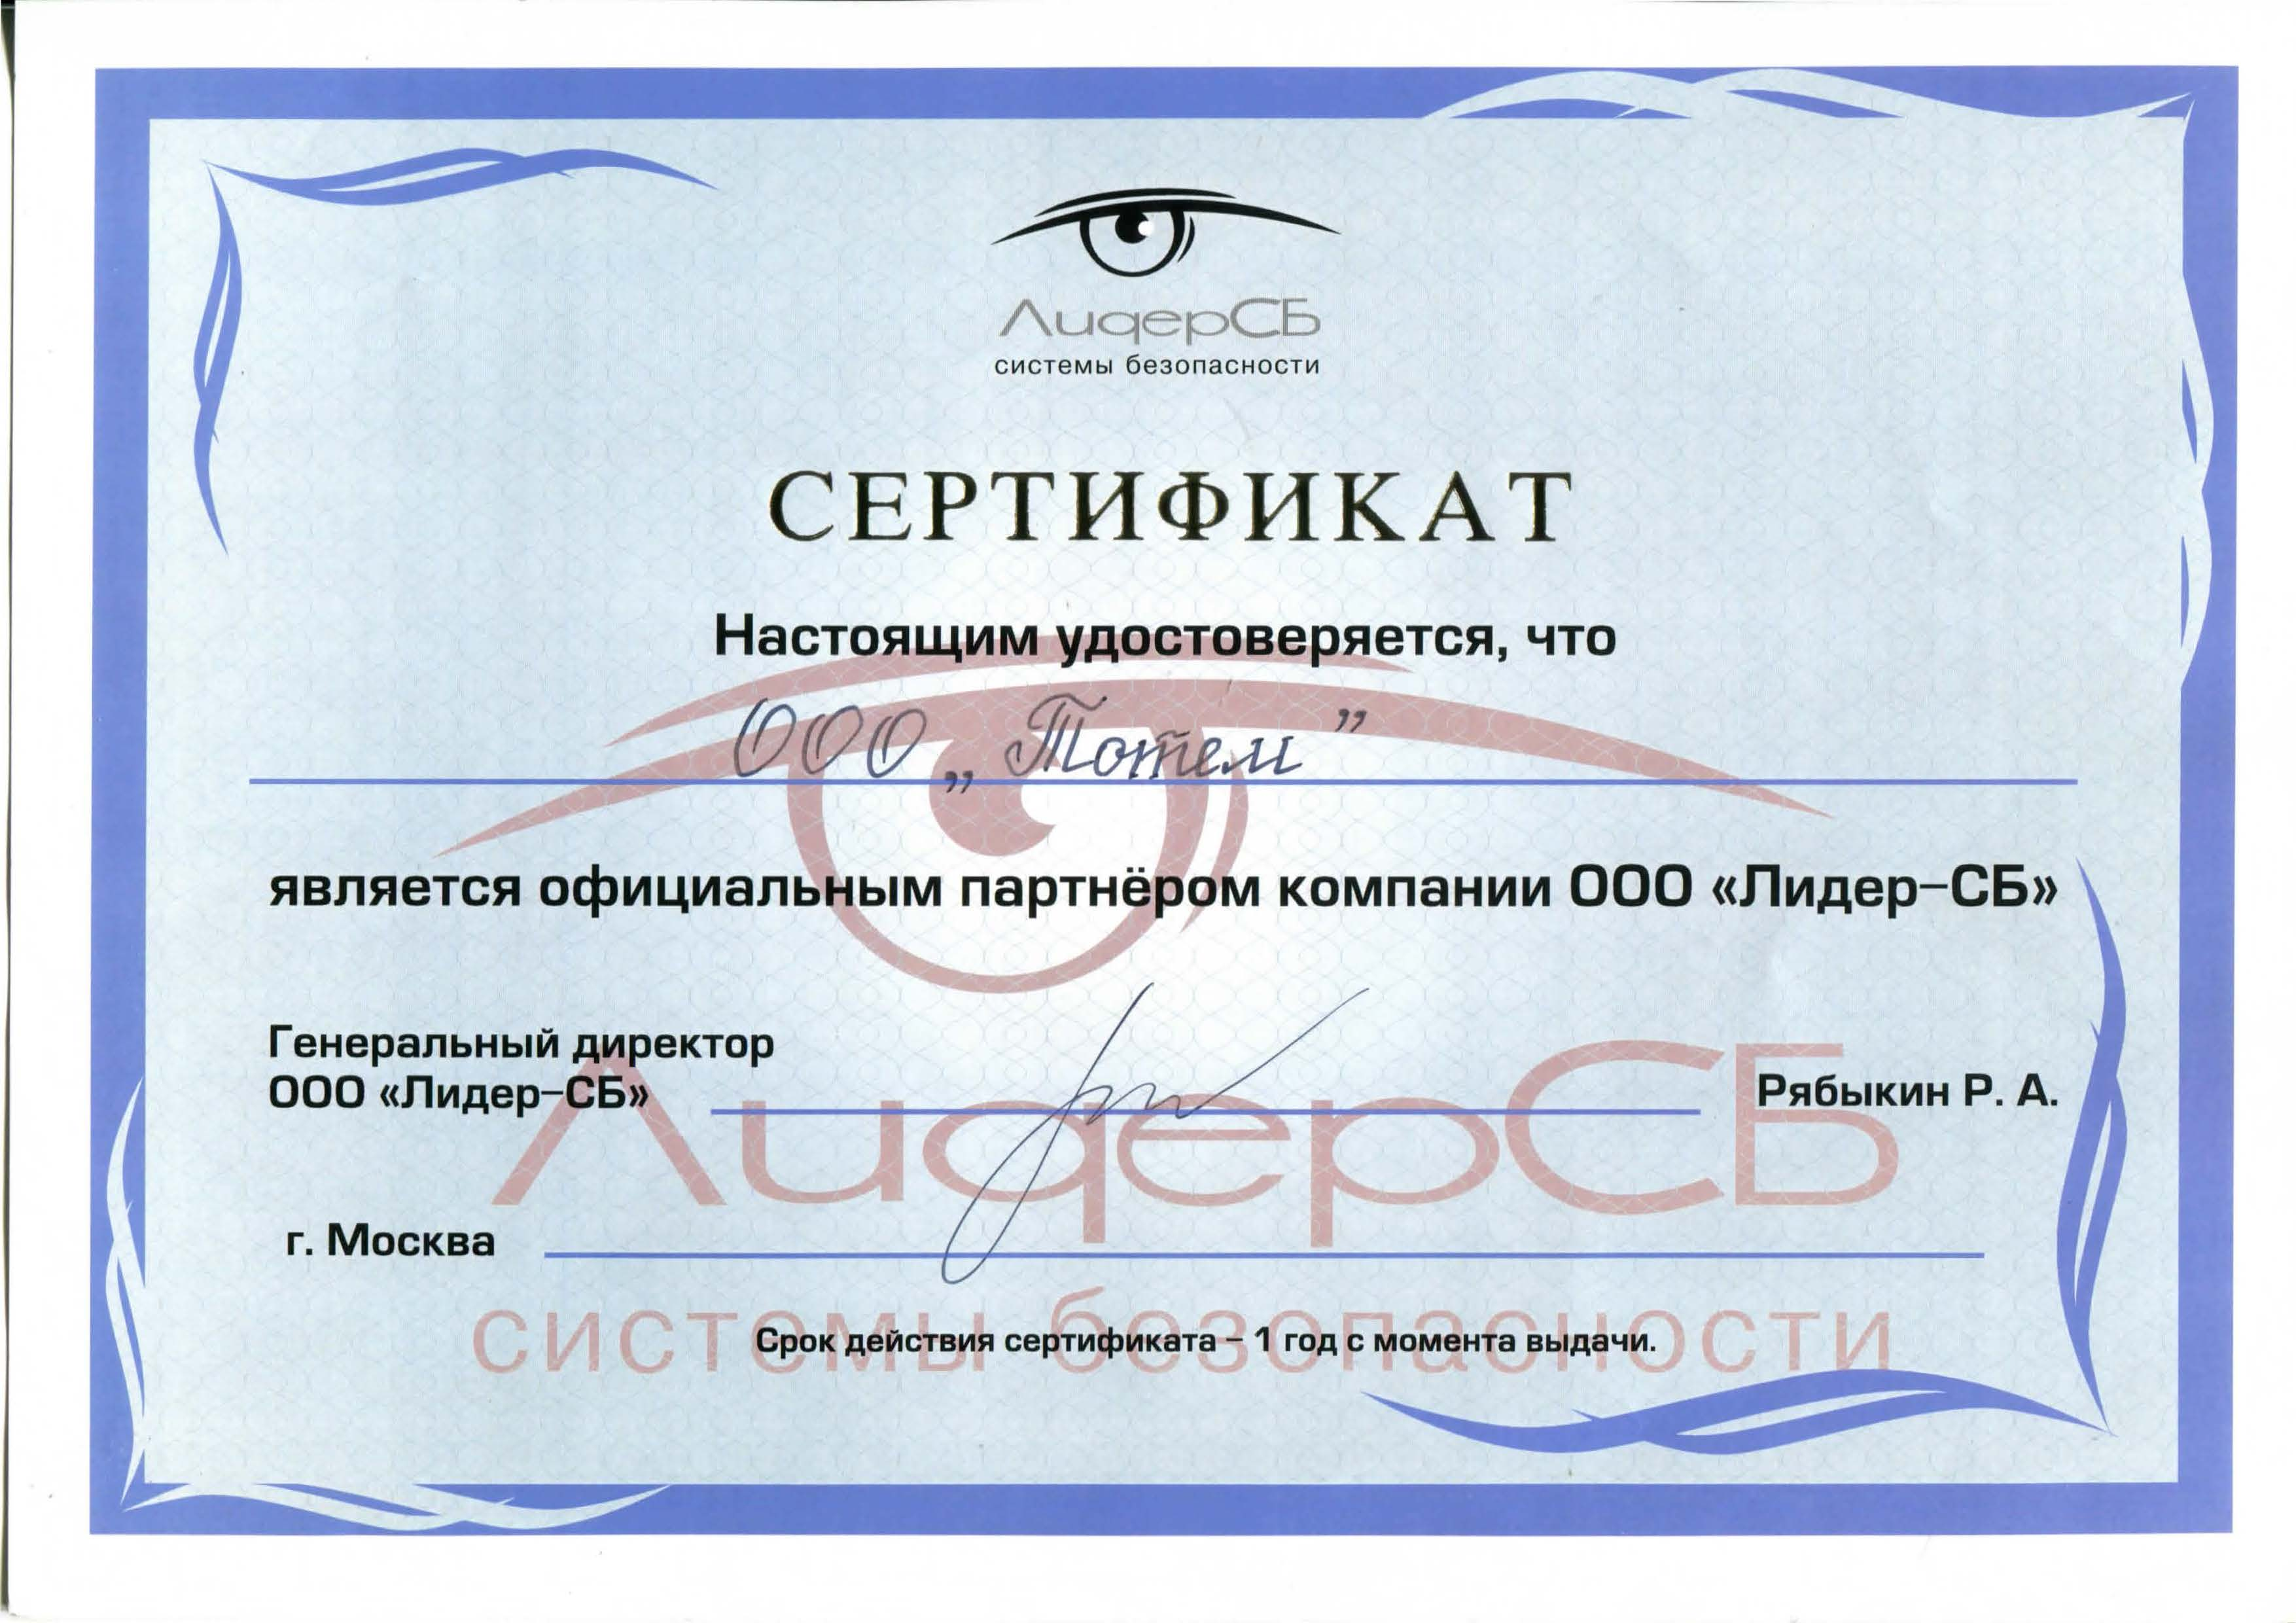 Сертификат_Лидер-СБ.jpg